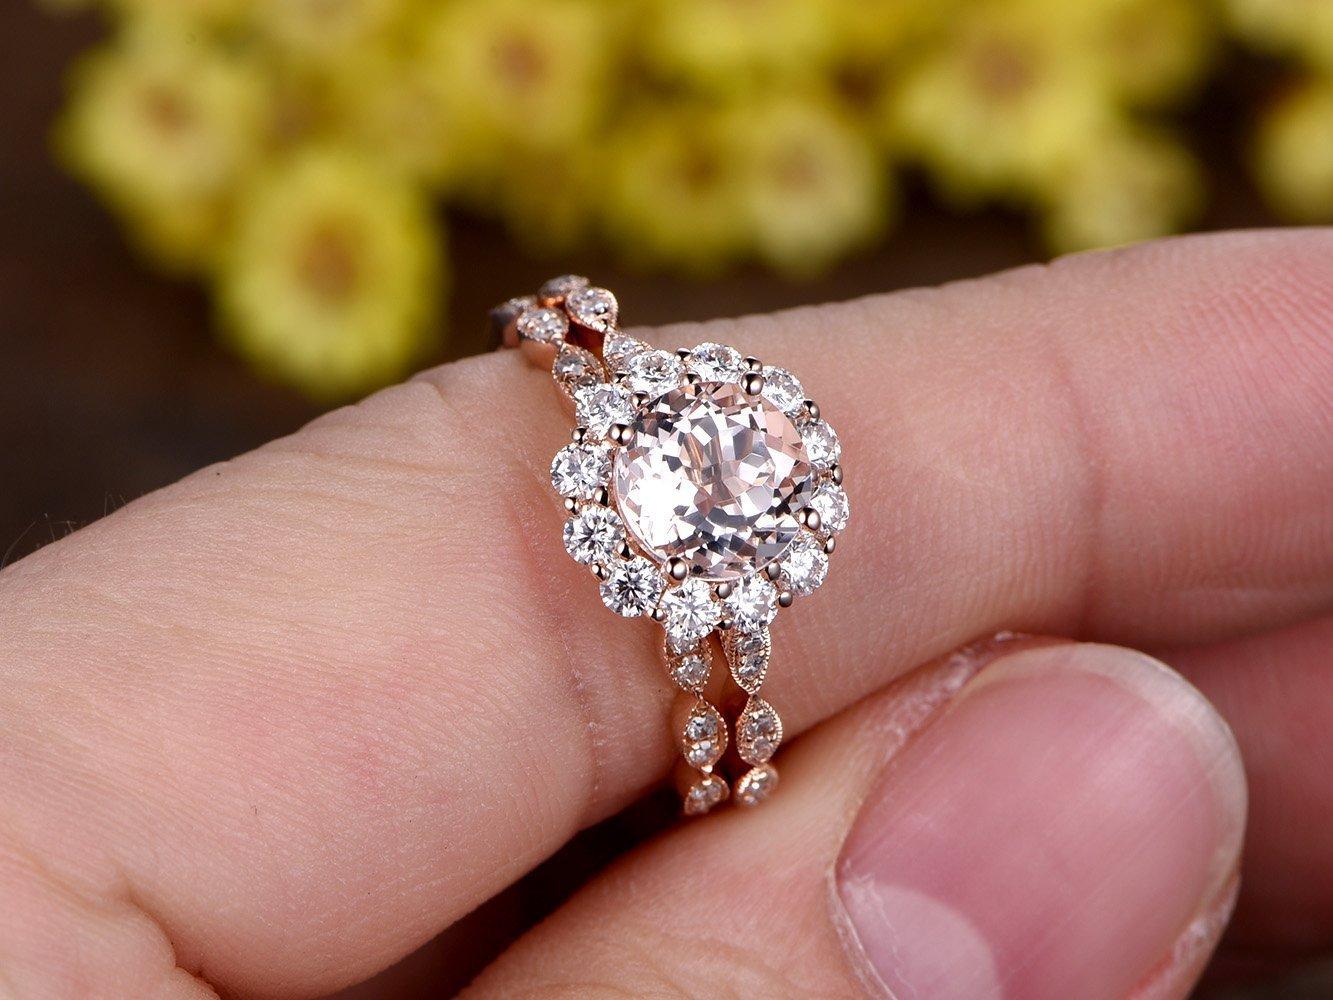 Amazon.com: 2pcs Wedding Ring Set,7mm Round Cut 1.5ctw VS Natural ...